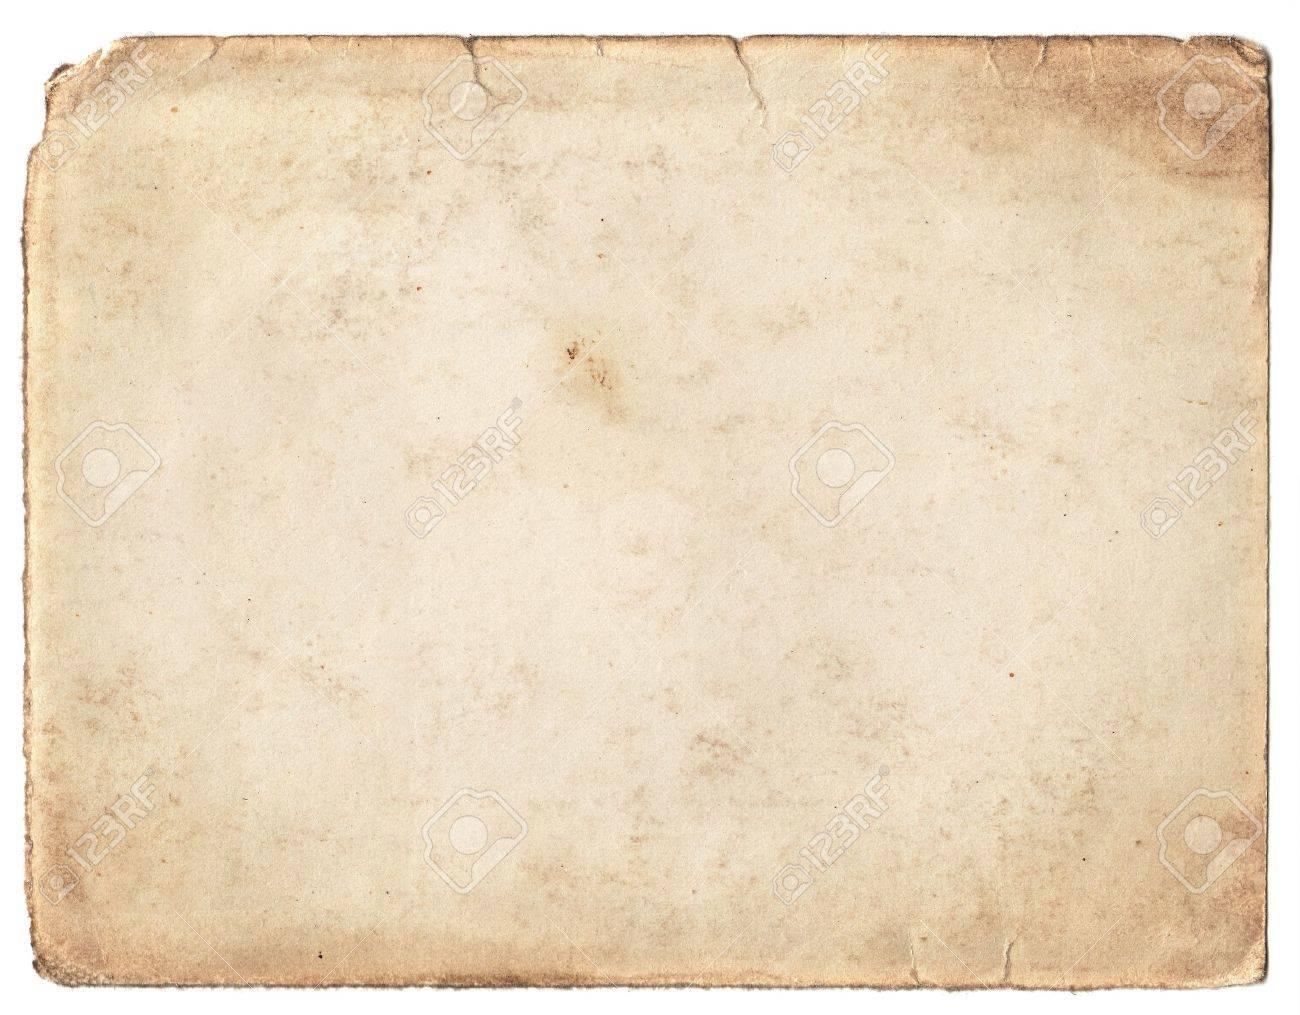 Blank vintage photo paper isolated on white background Stock Photo - 15586712